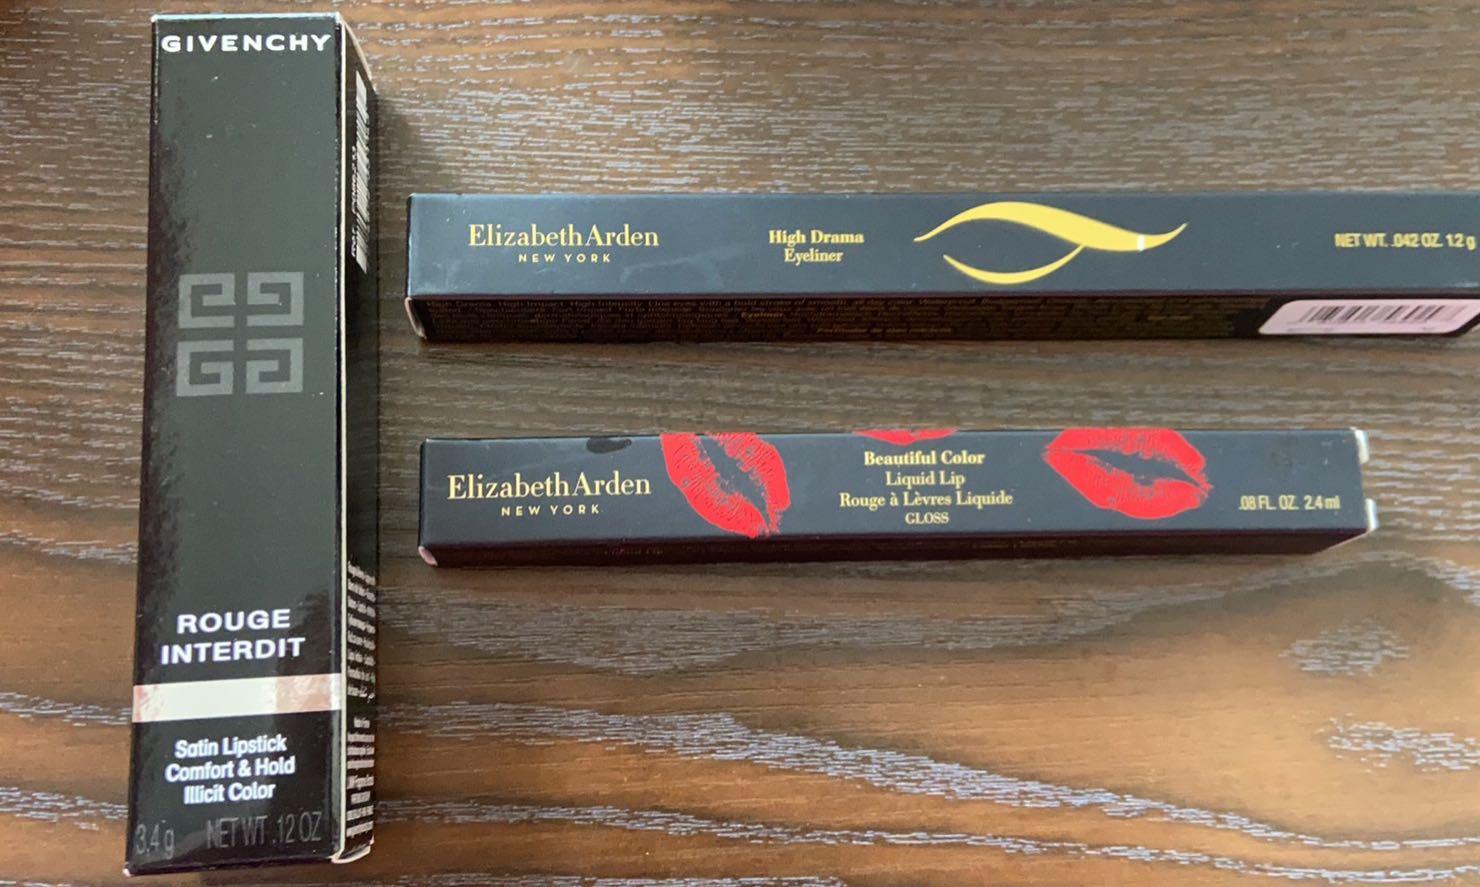 Givenchy & Arden Lipstick & Eyeliner